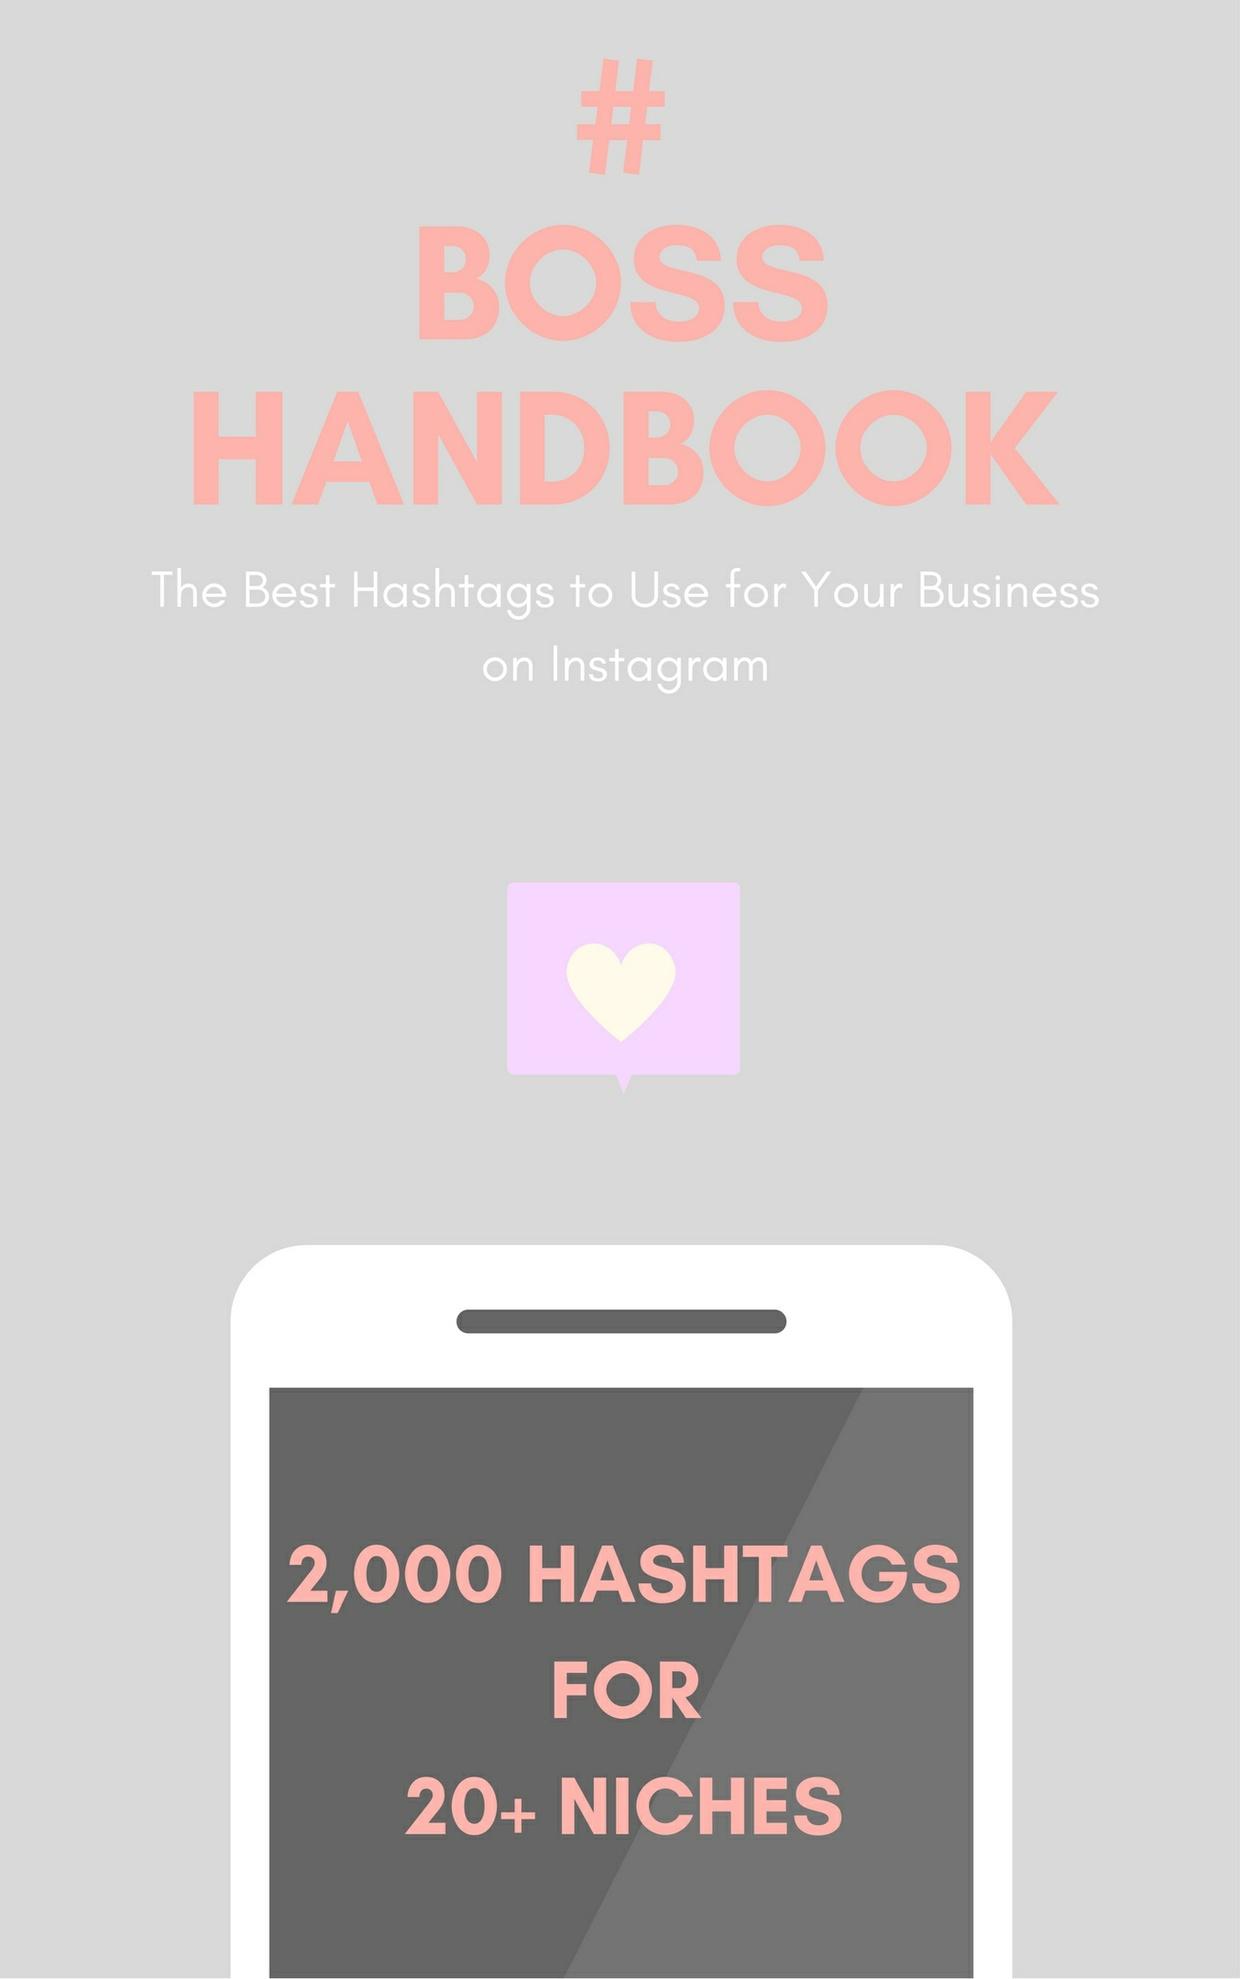 #BossHandbook